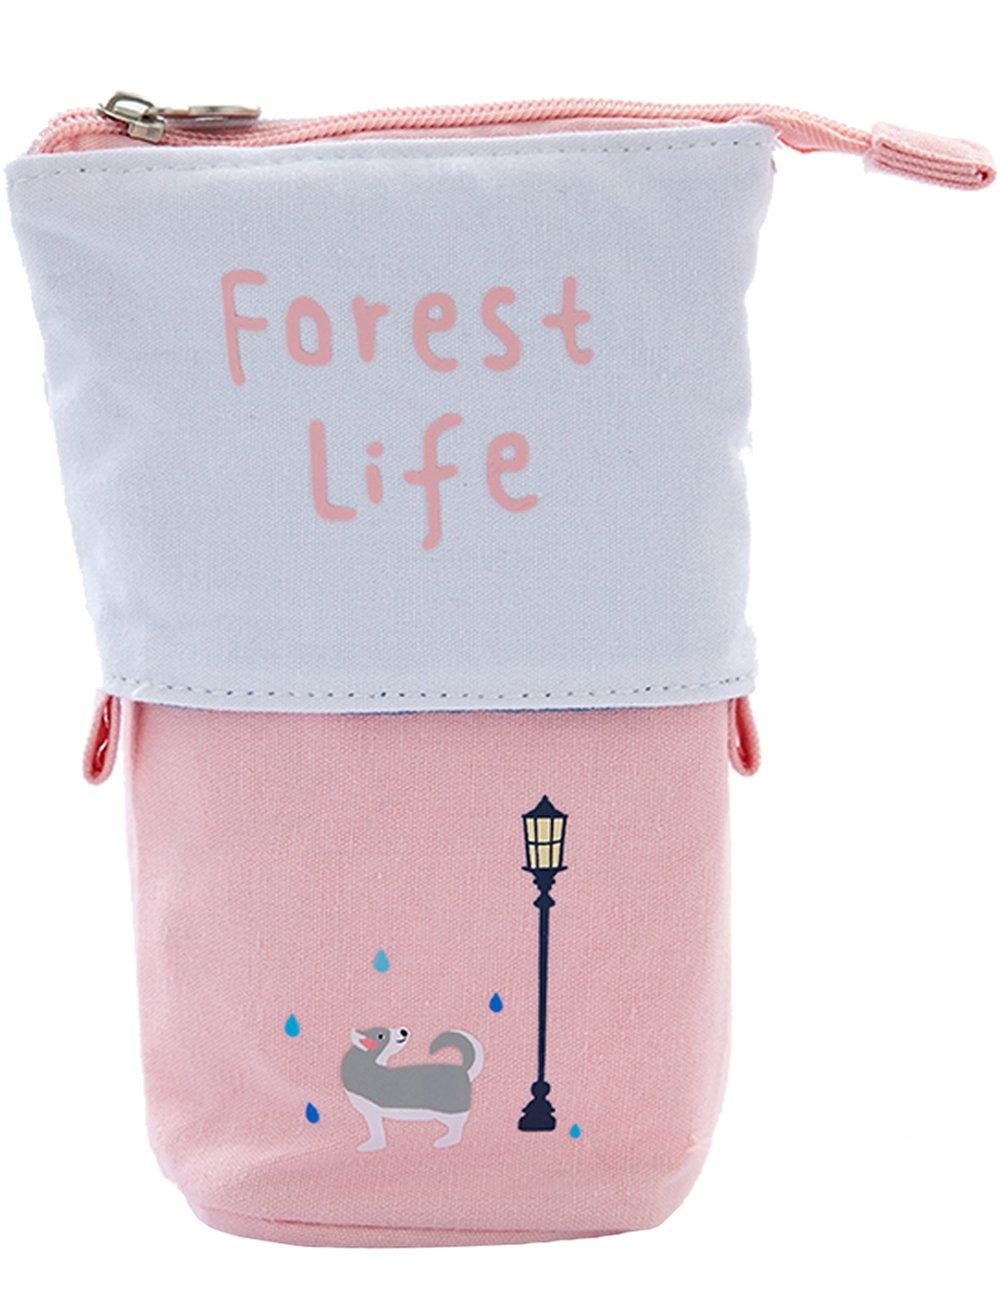 Lapicero vertical iSuperb de lona, organizador adorable para pinceles de maquillaje, bolsa de almacenamiento 19,5 x 8,5 x 13 cm, color rosa: Amazon.es: ...